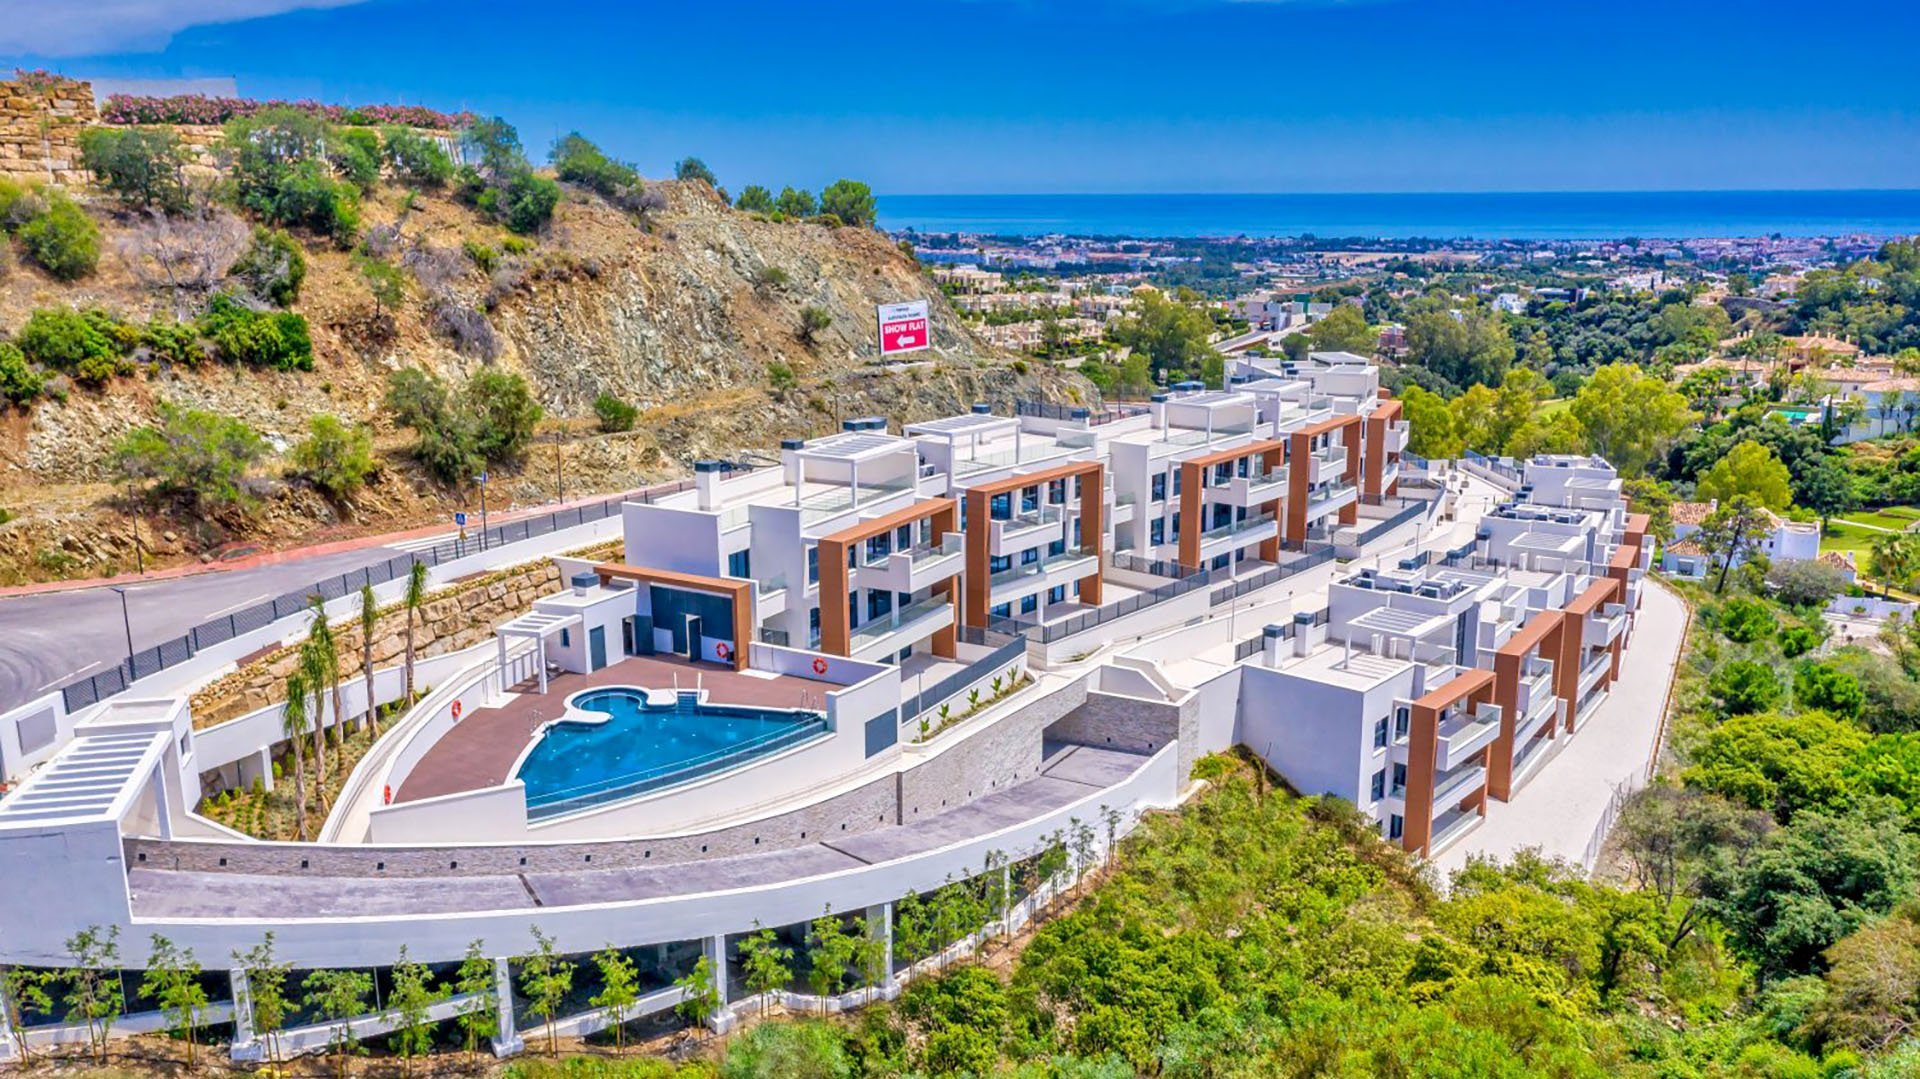 Alborada Homes: Modern apartments in Benahavís